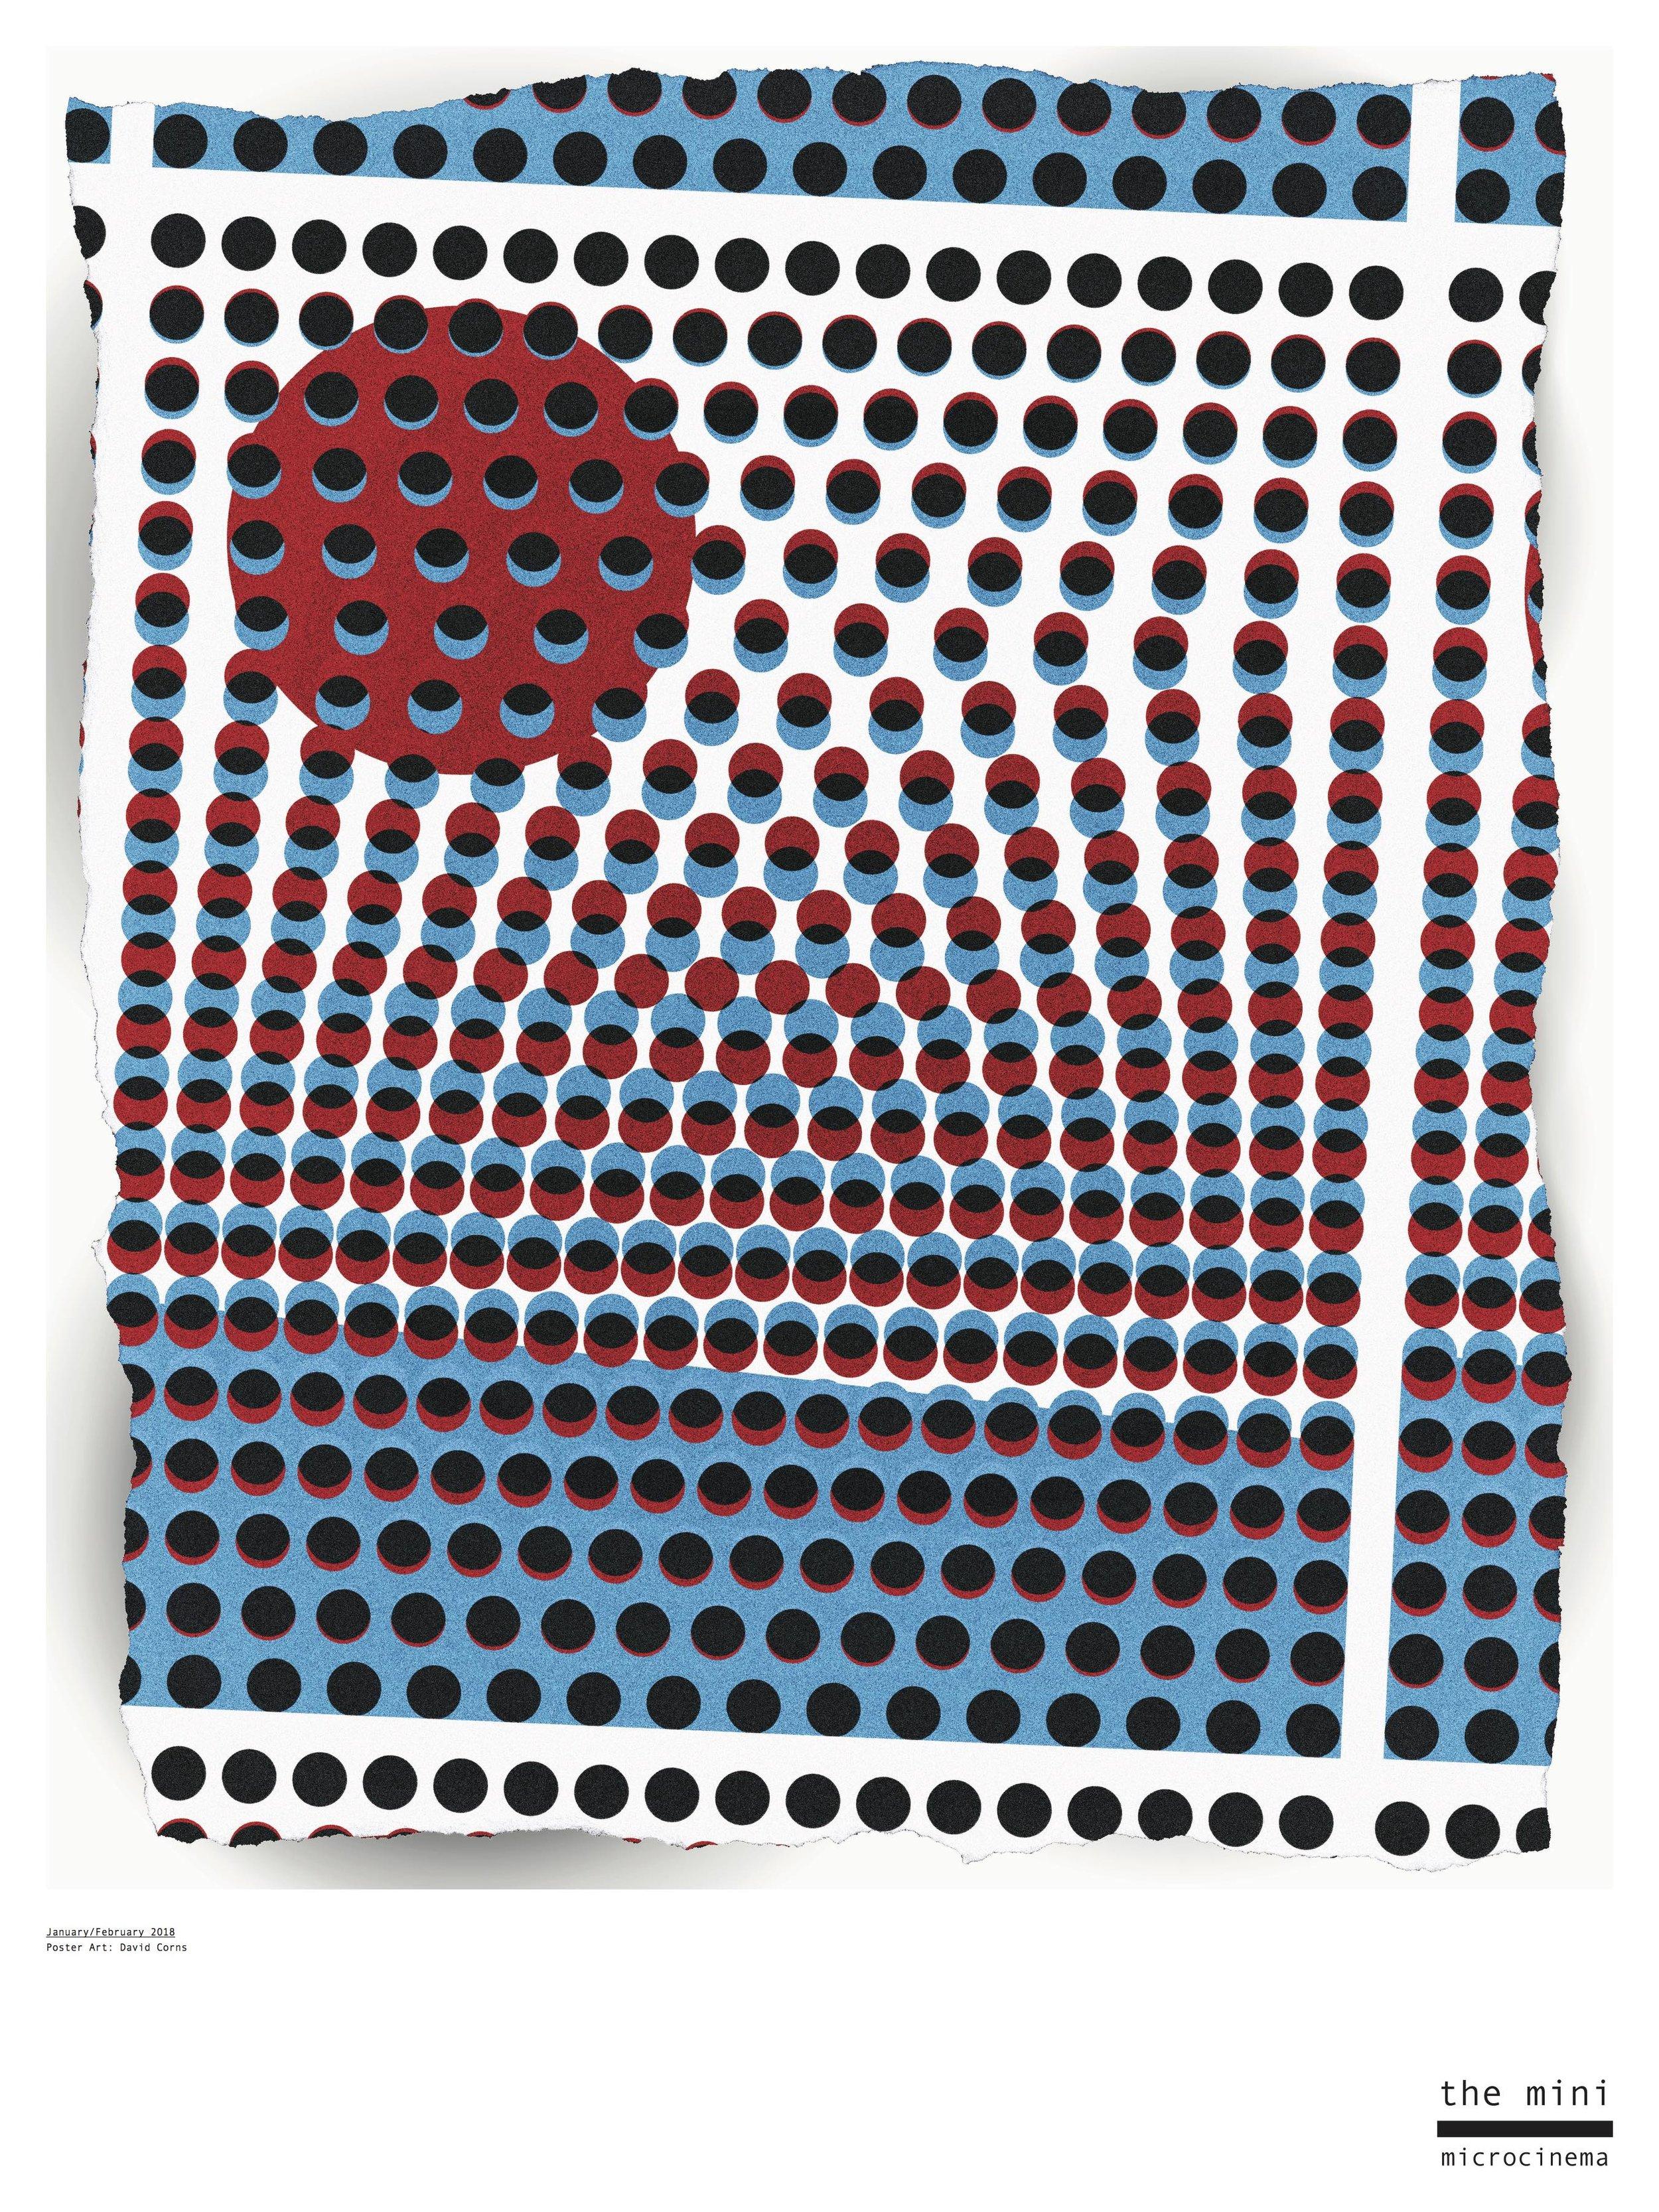 #028 - David Corns